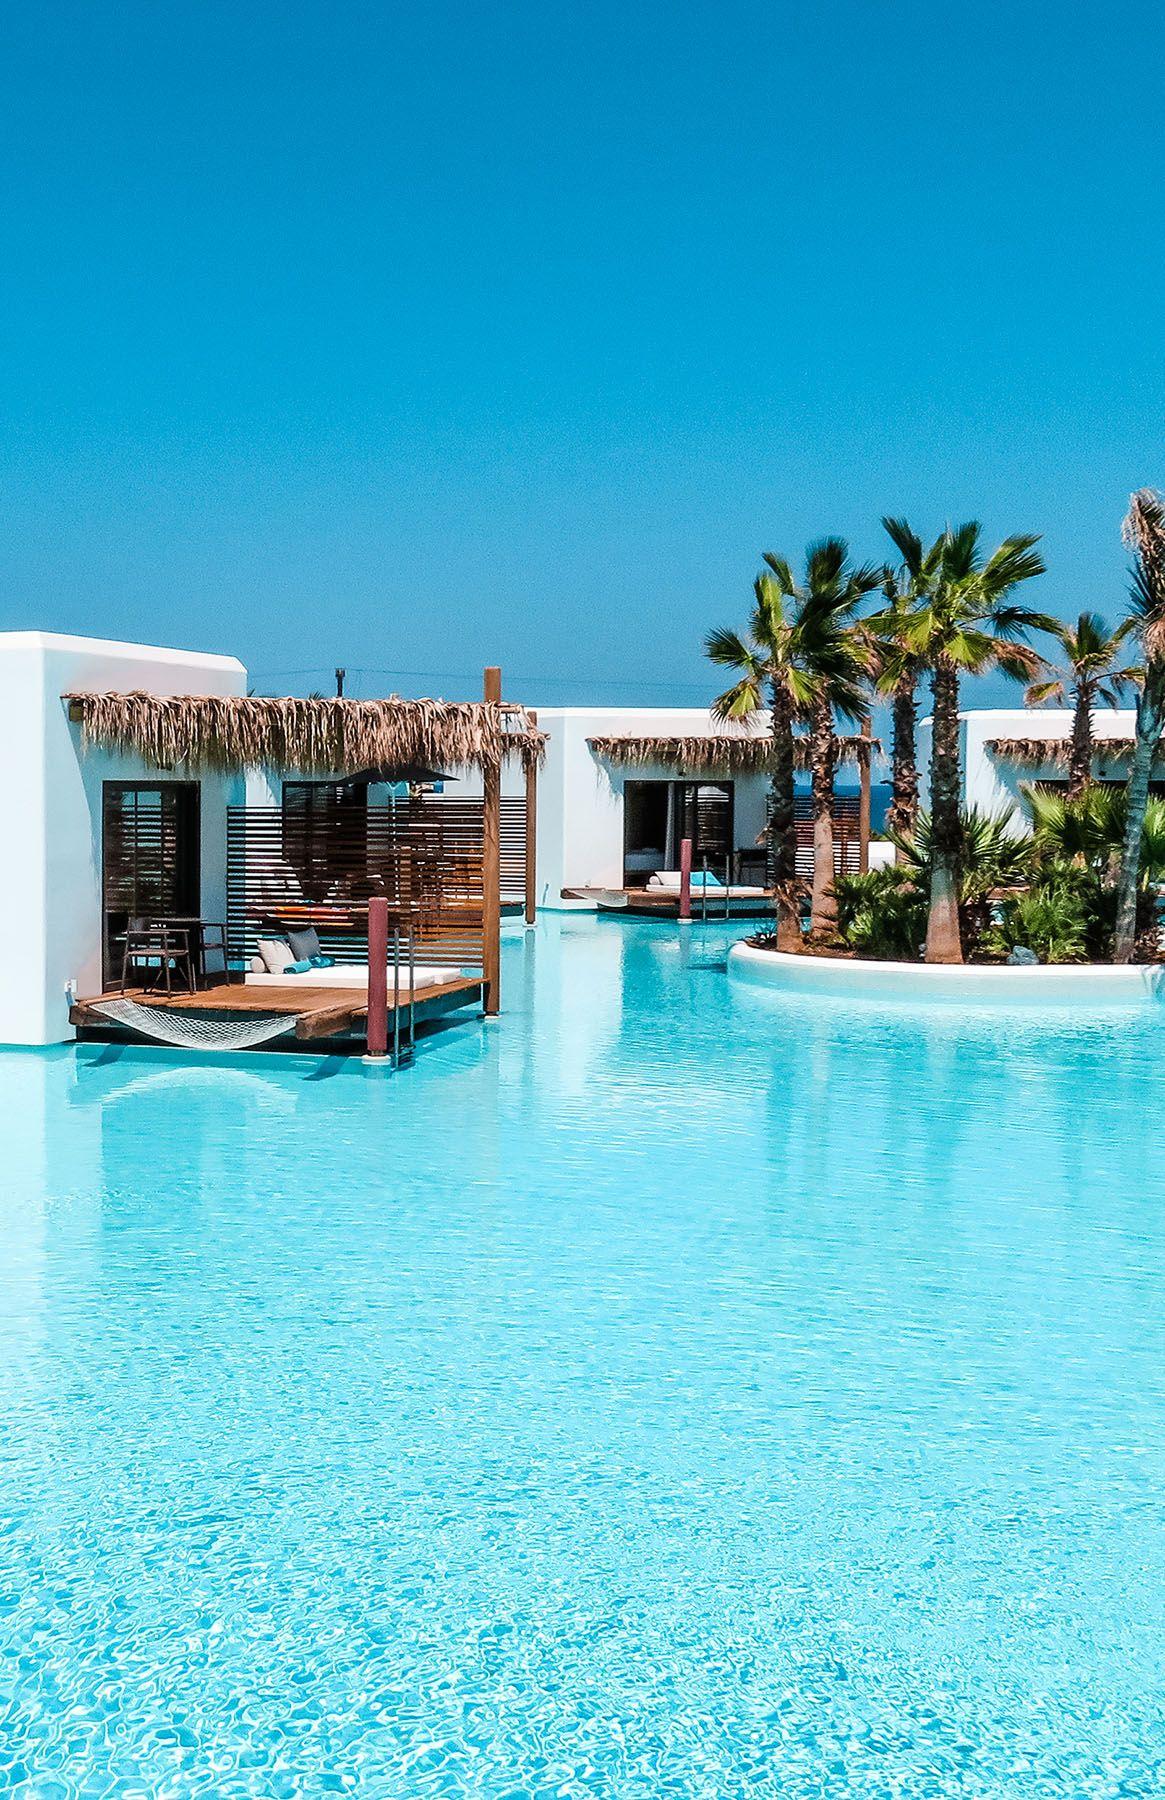 stella island luxury resort spa kreta reiseblog reiseberichte tipps fotos pinterest. Black Bedroom Furniture Sets. Home Design Ideas